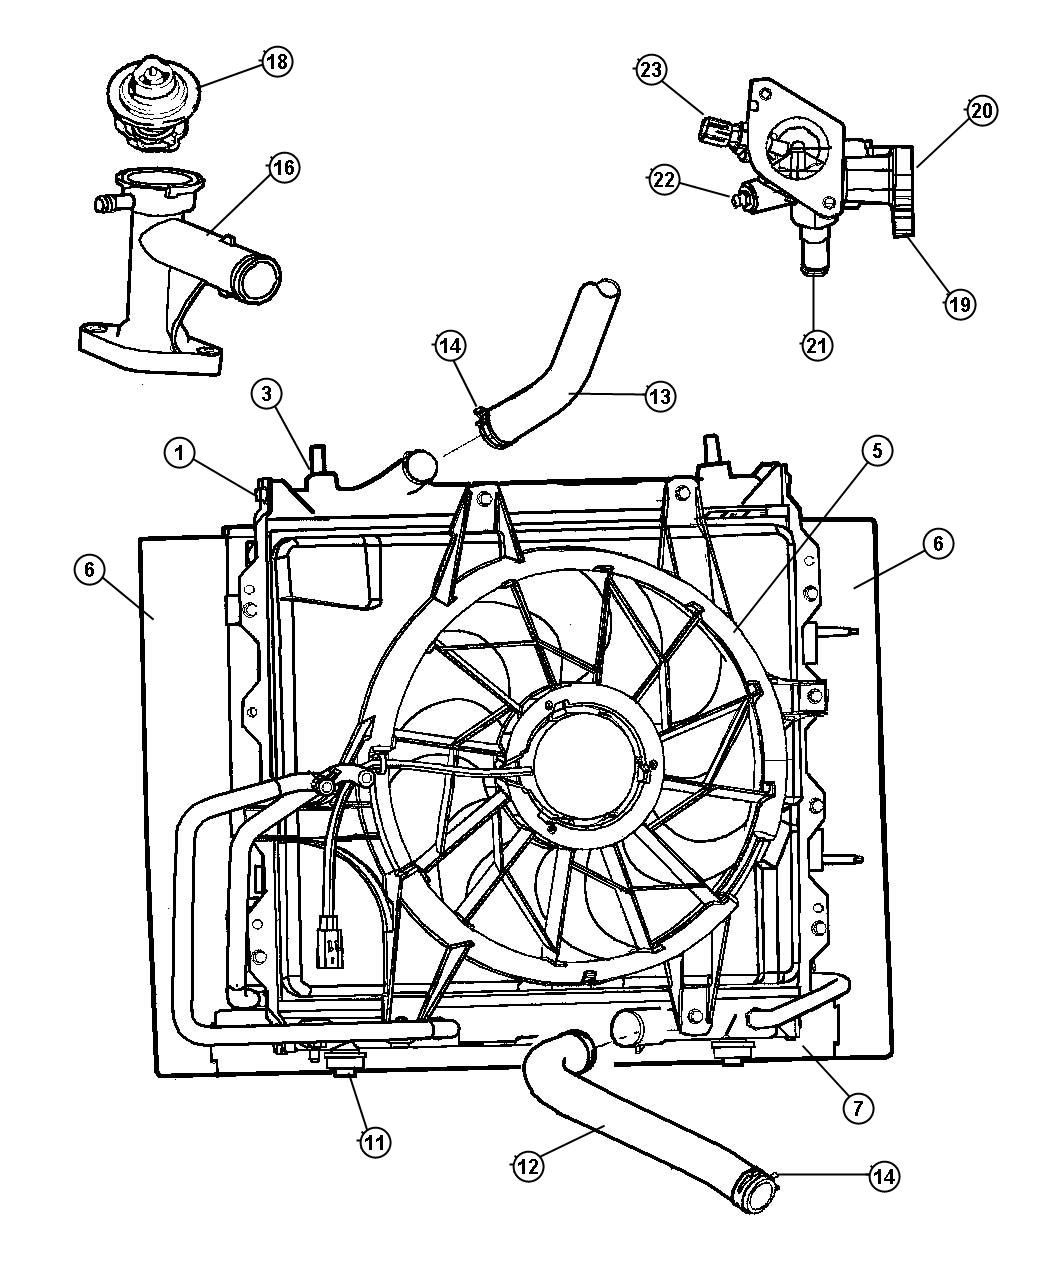 2001 pt cruiser wiring diagram cadet heater international pro star headlight